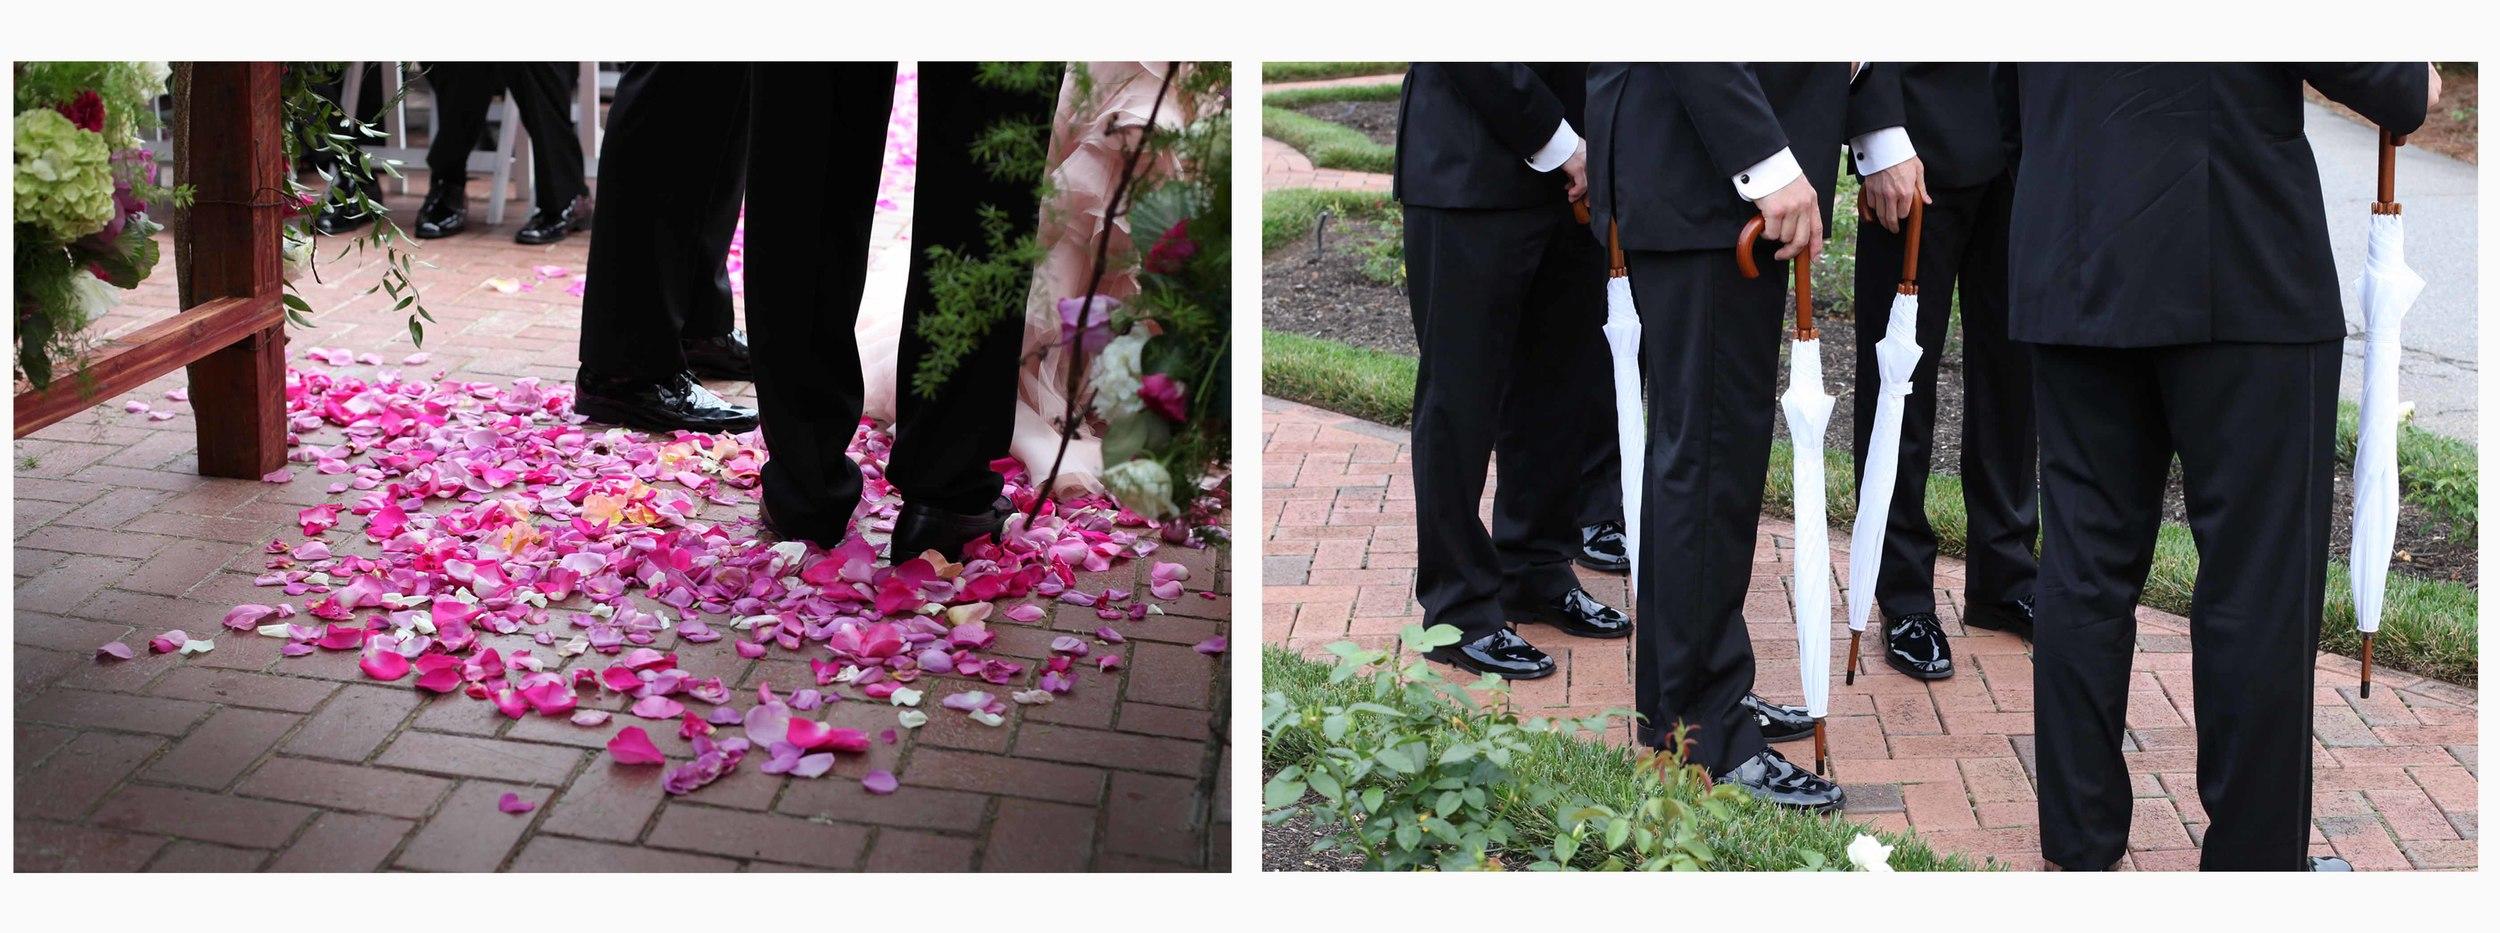 The groomsmen sported white Biltmore umbrellas.